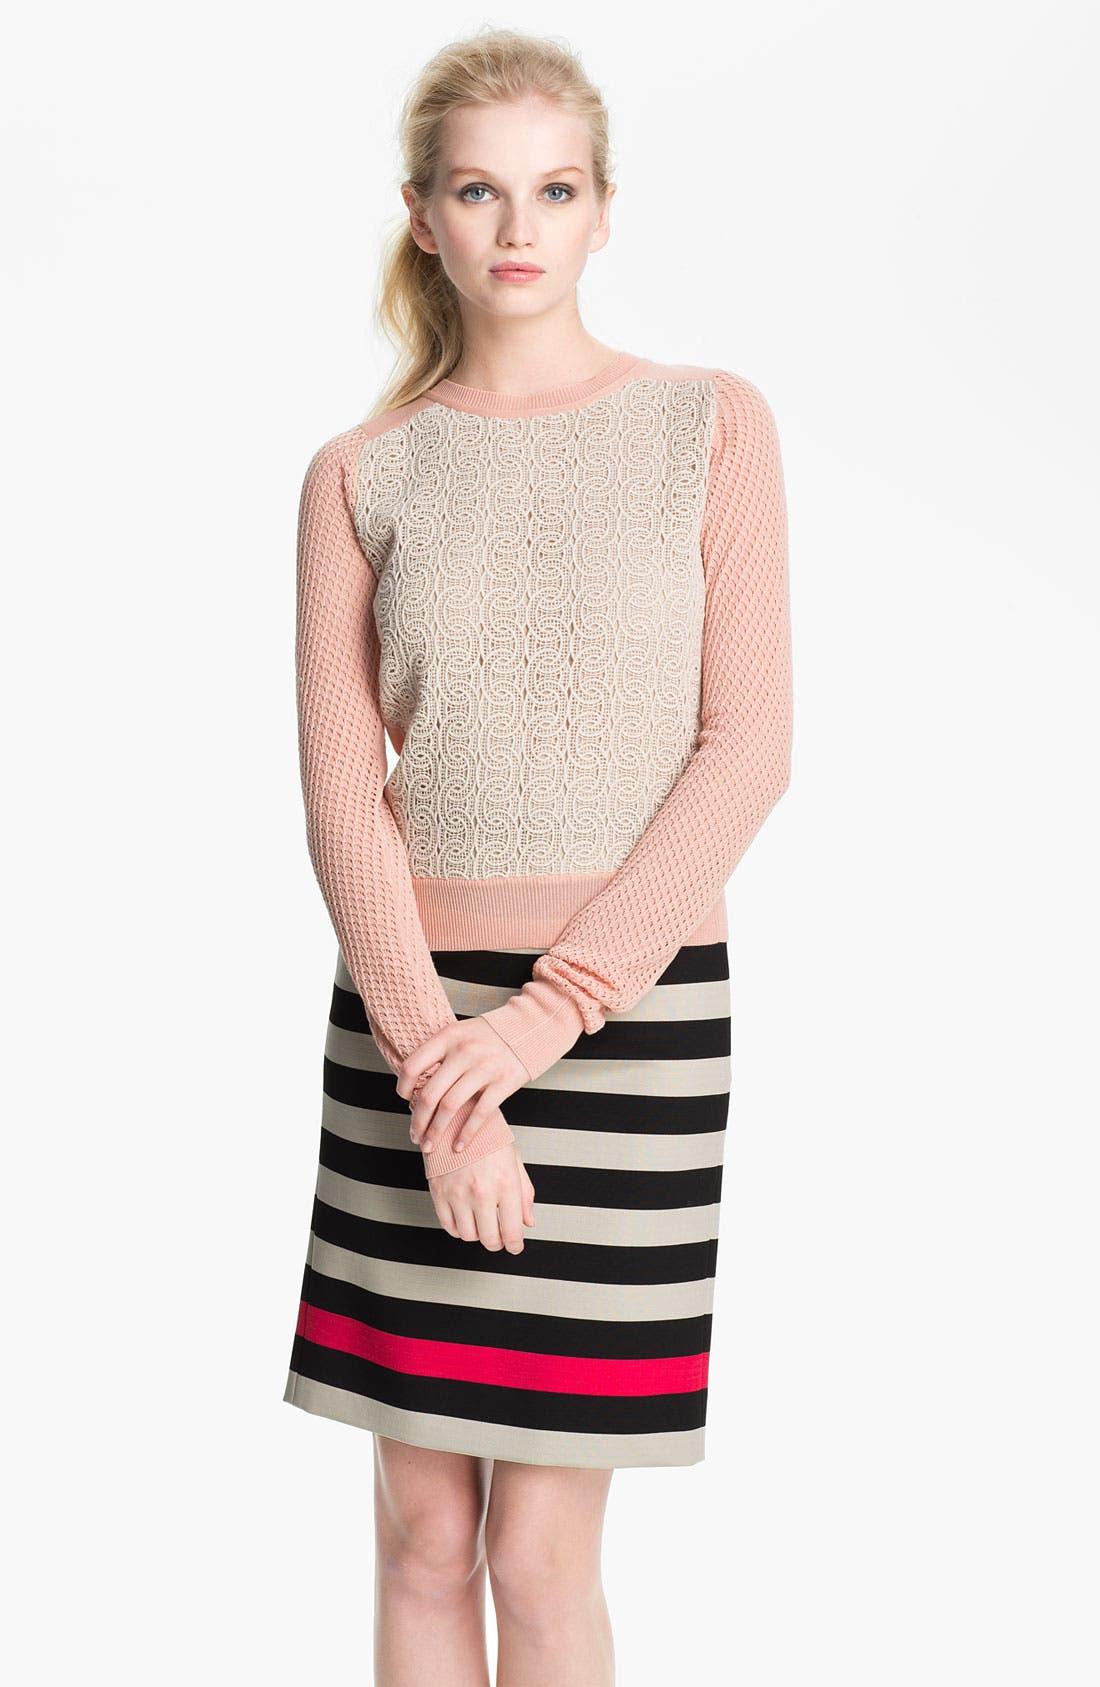 Alternate Image 1 Selected - Diane von Furstenberg 'Jordana' Sweater